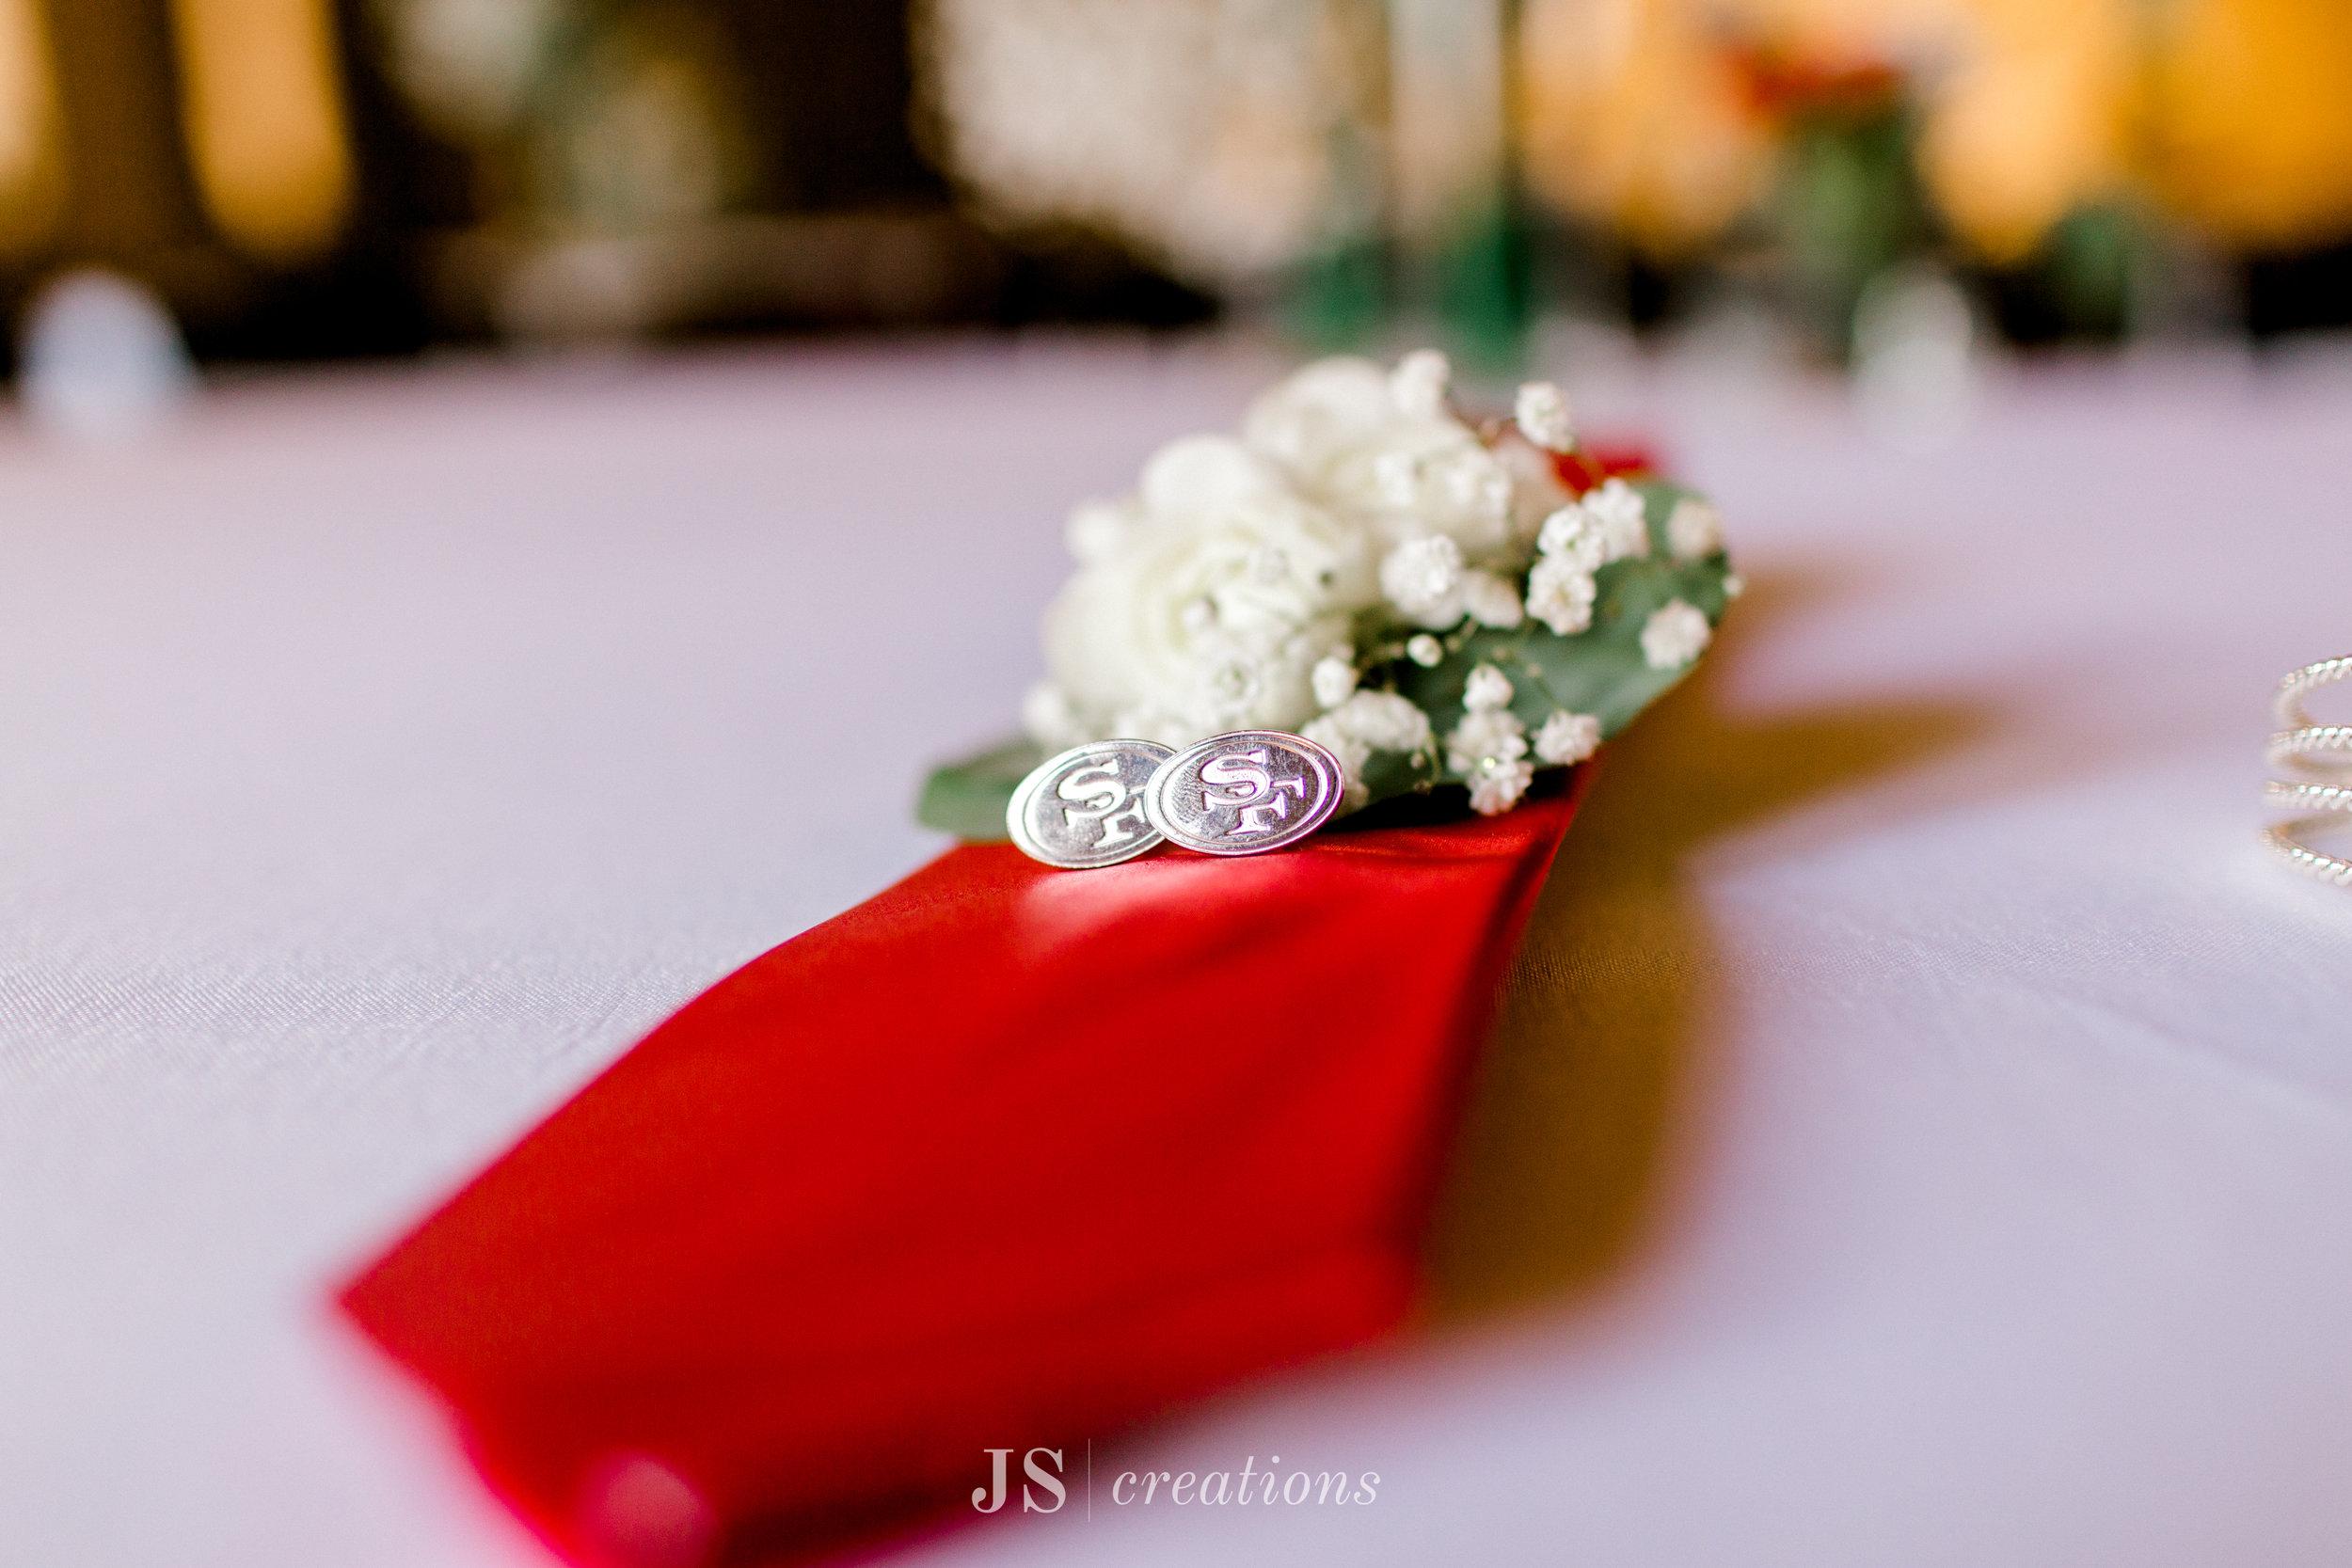 JSCreations_Weddings-31.jpg